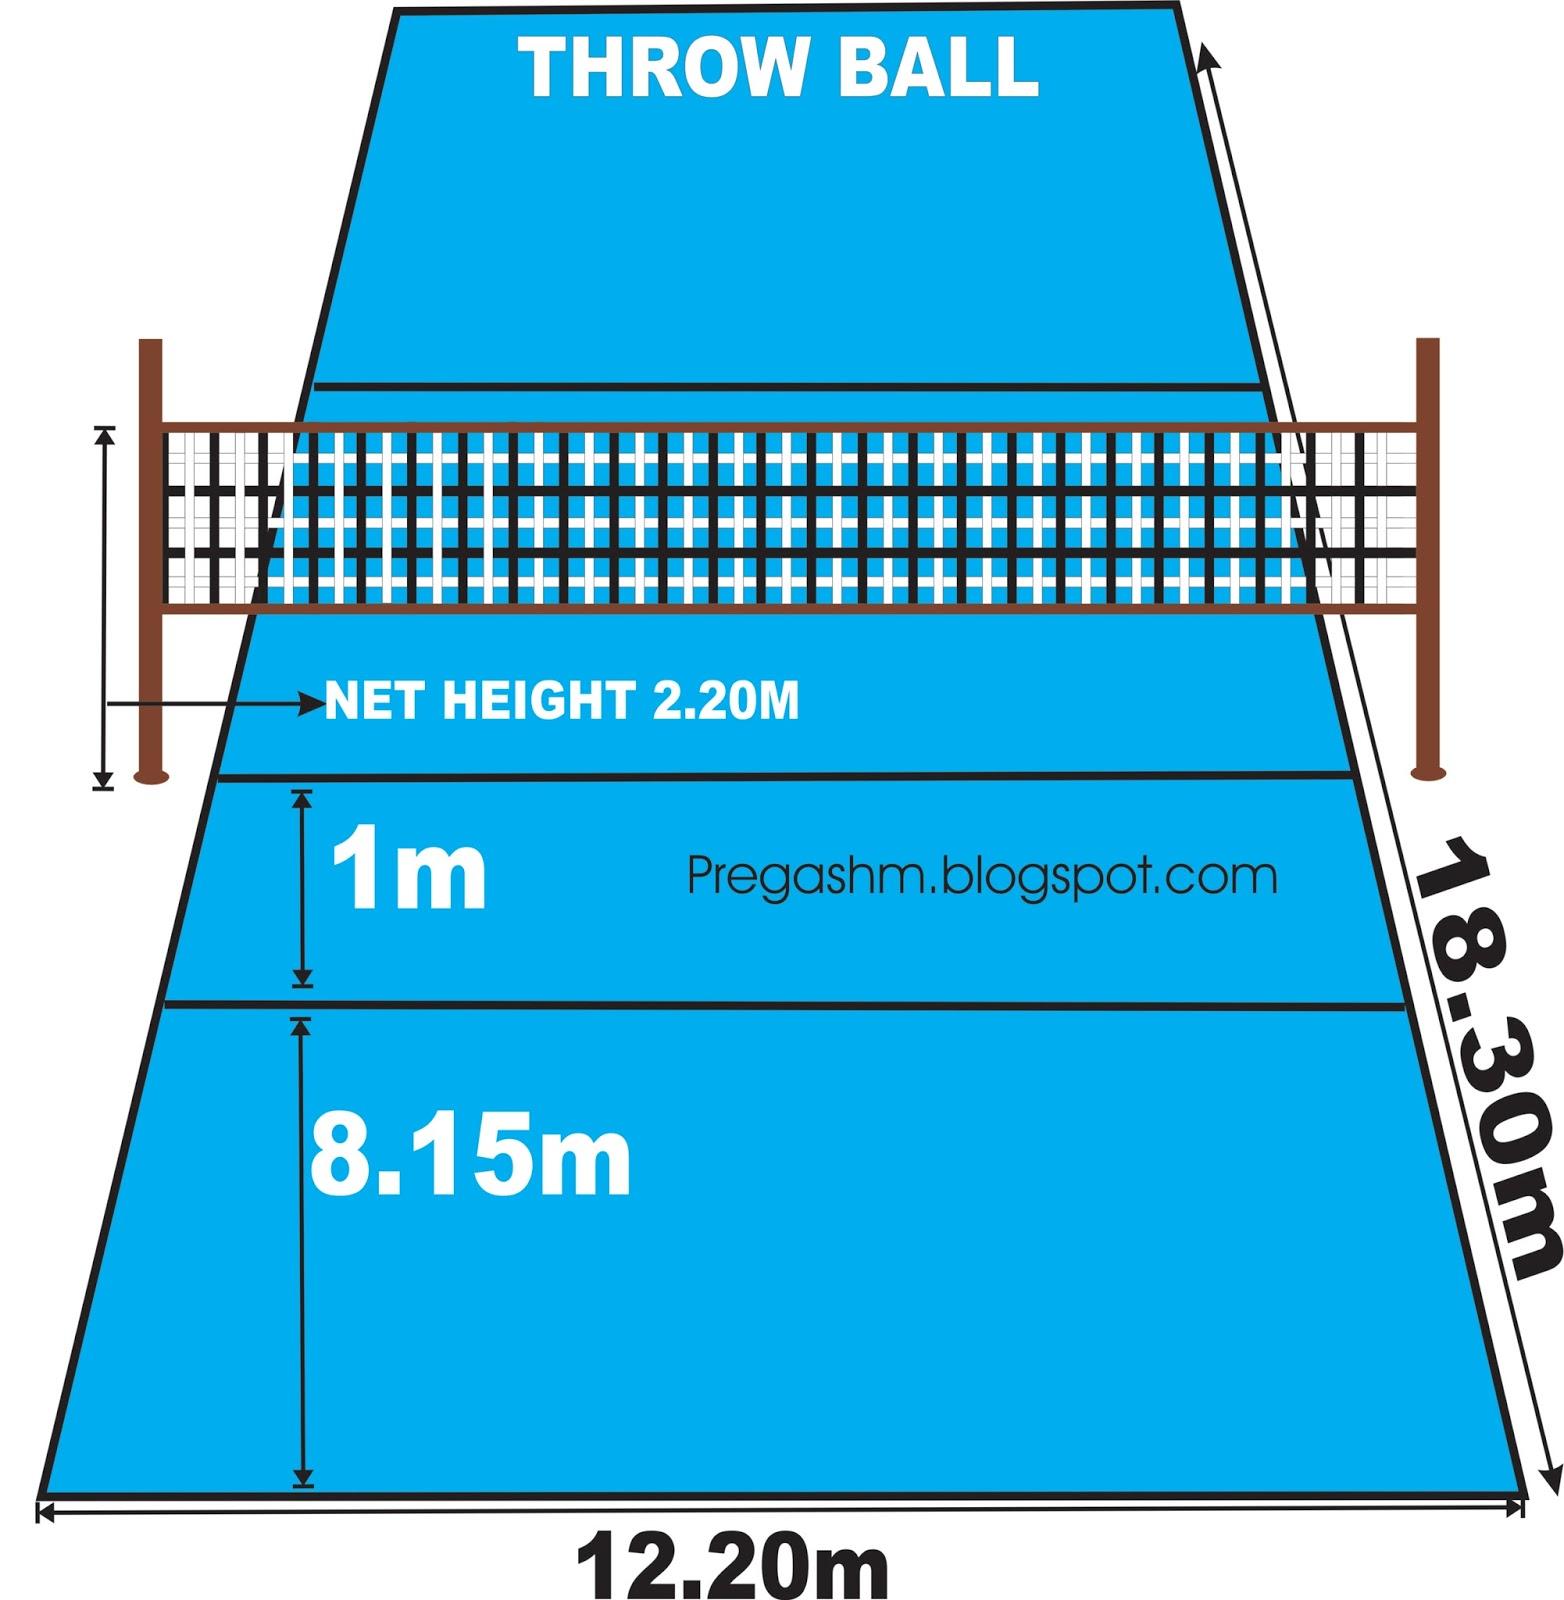 Handball Court Diagram Led Driving 12v Wiring M Pregash Measurements